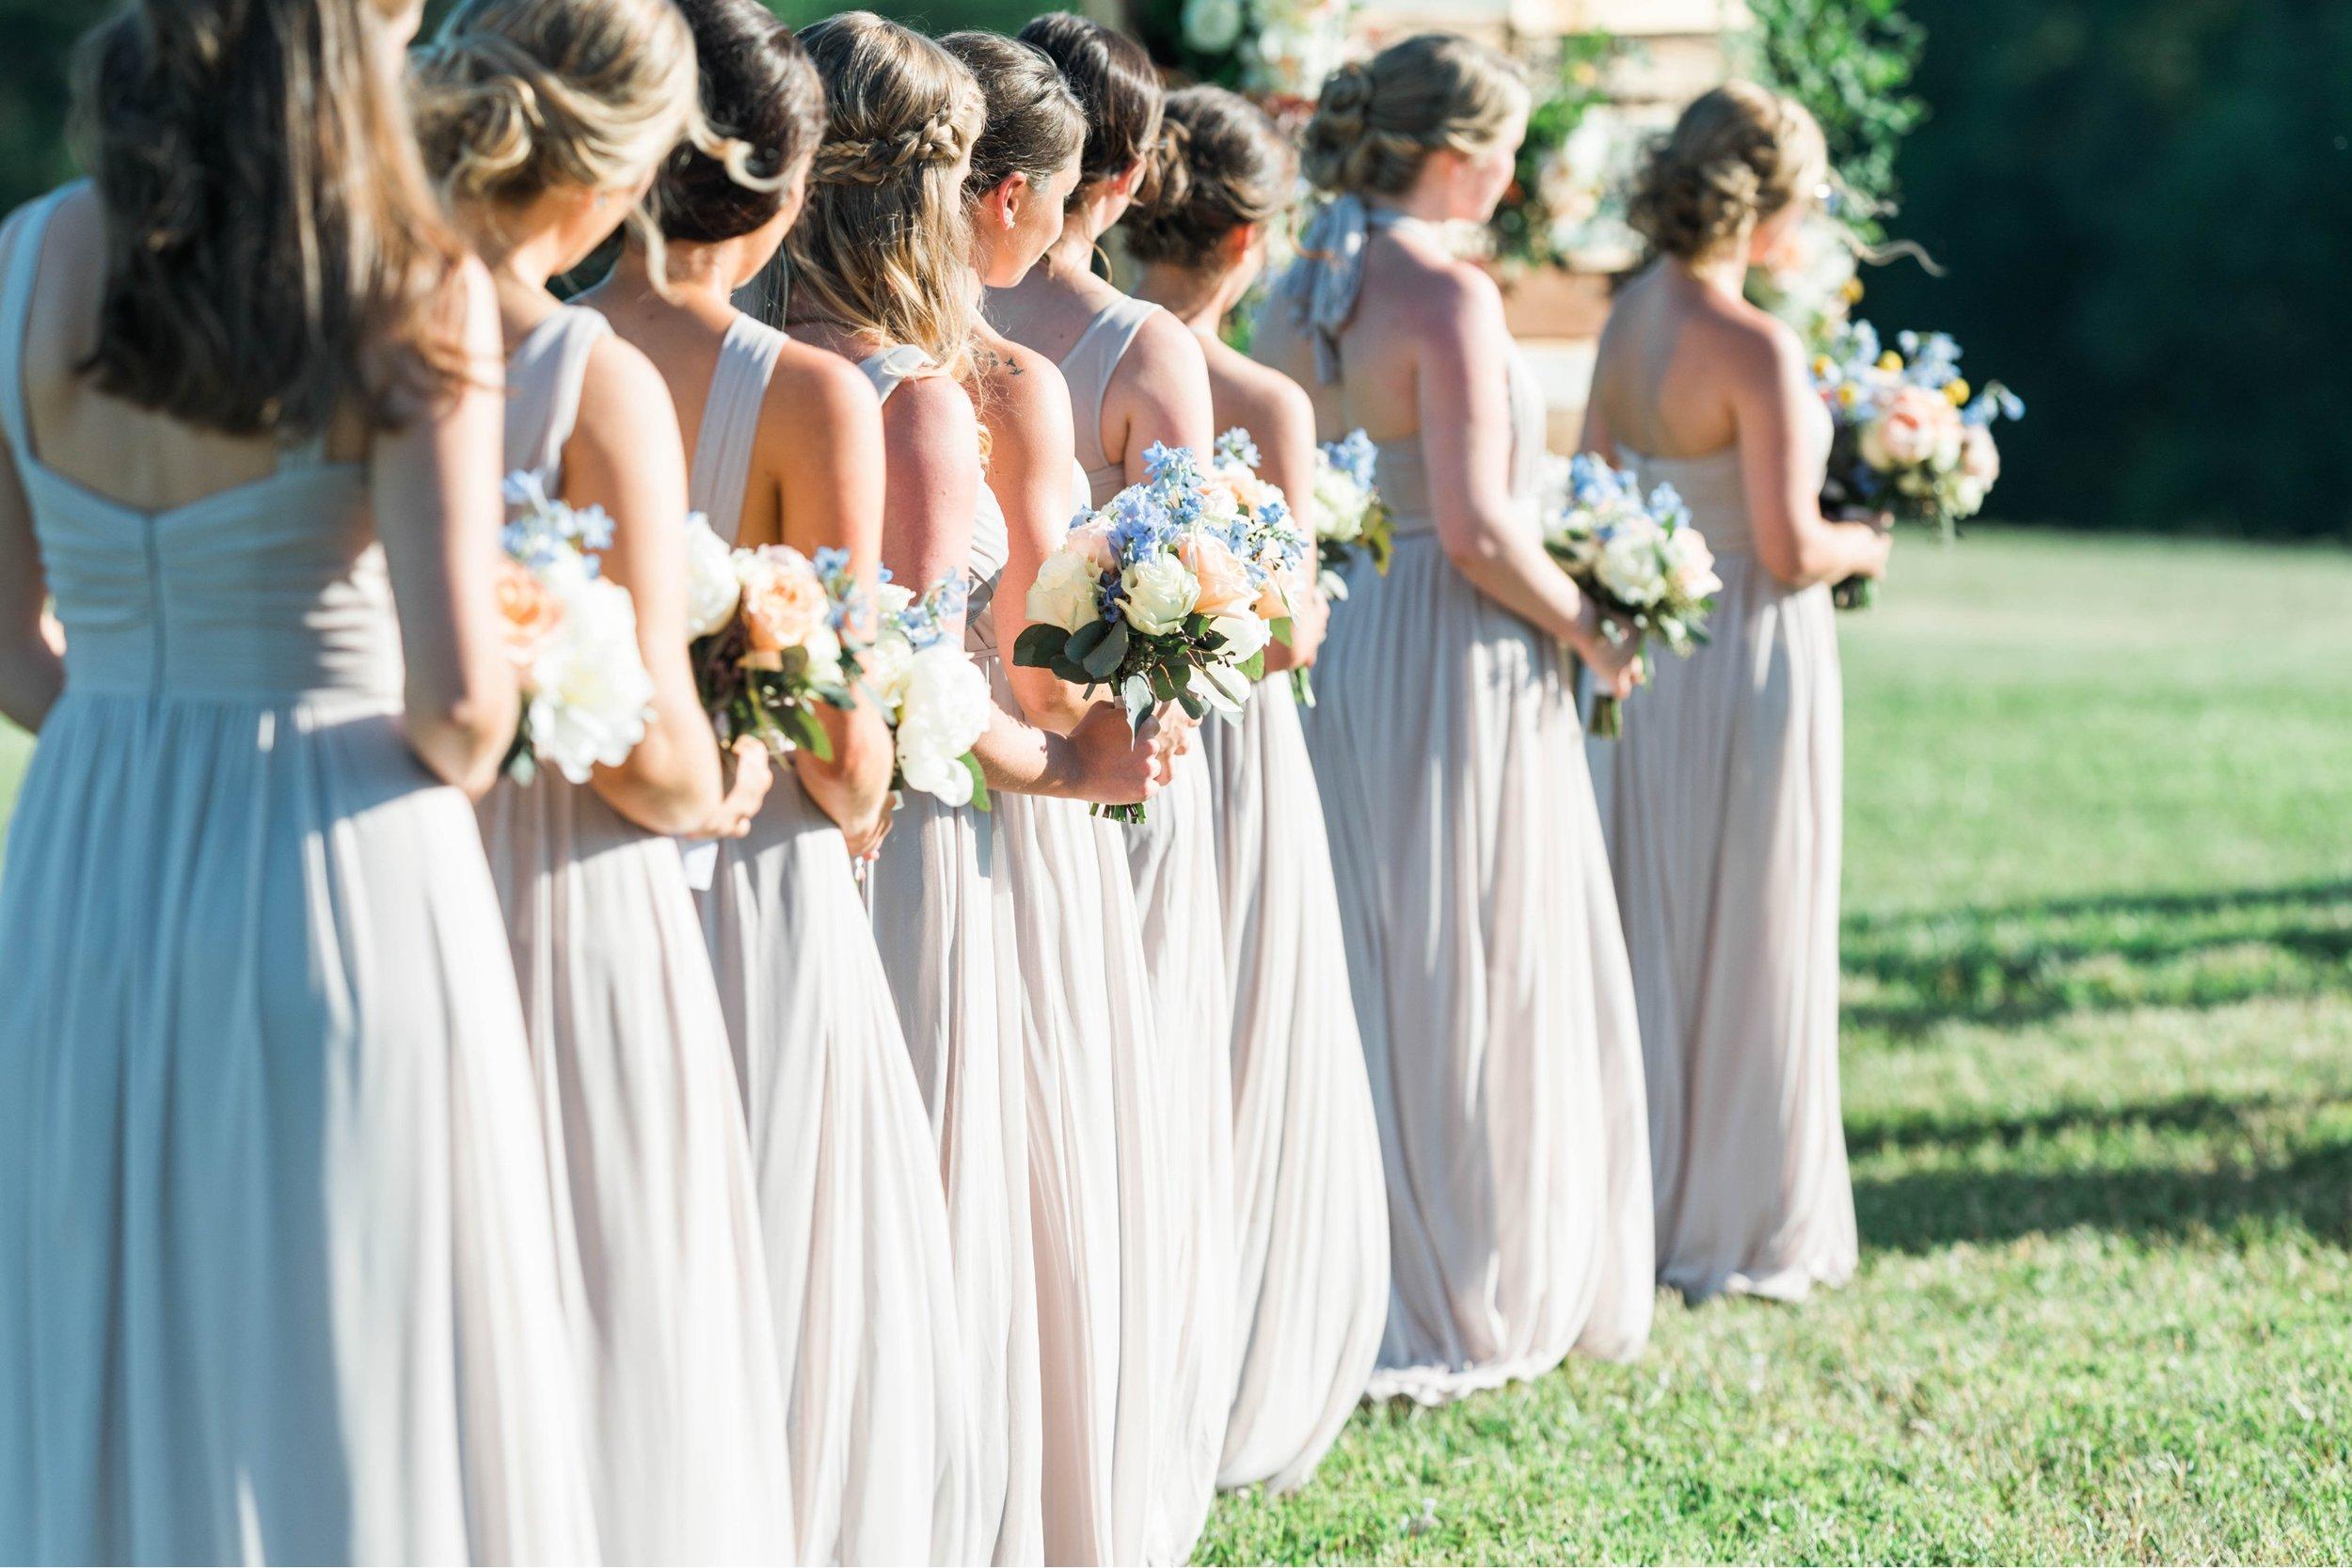 SorellaFarms_EvingtonVA_Lynchburgweddingphotographer_VirginiaweddingPhotographer_AshleyAndrewSorellaFarmsWedding 47.jpg